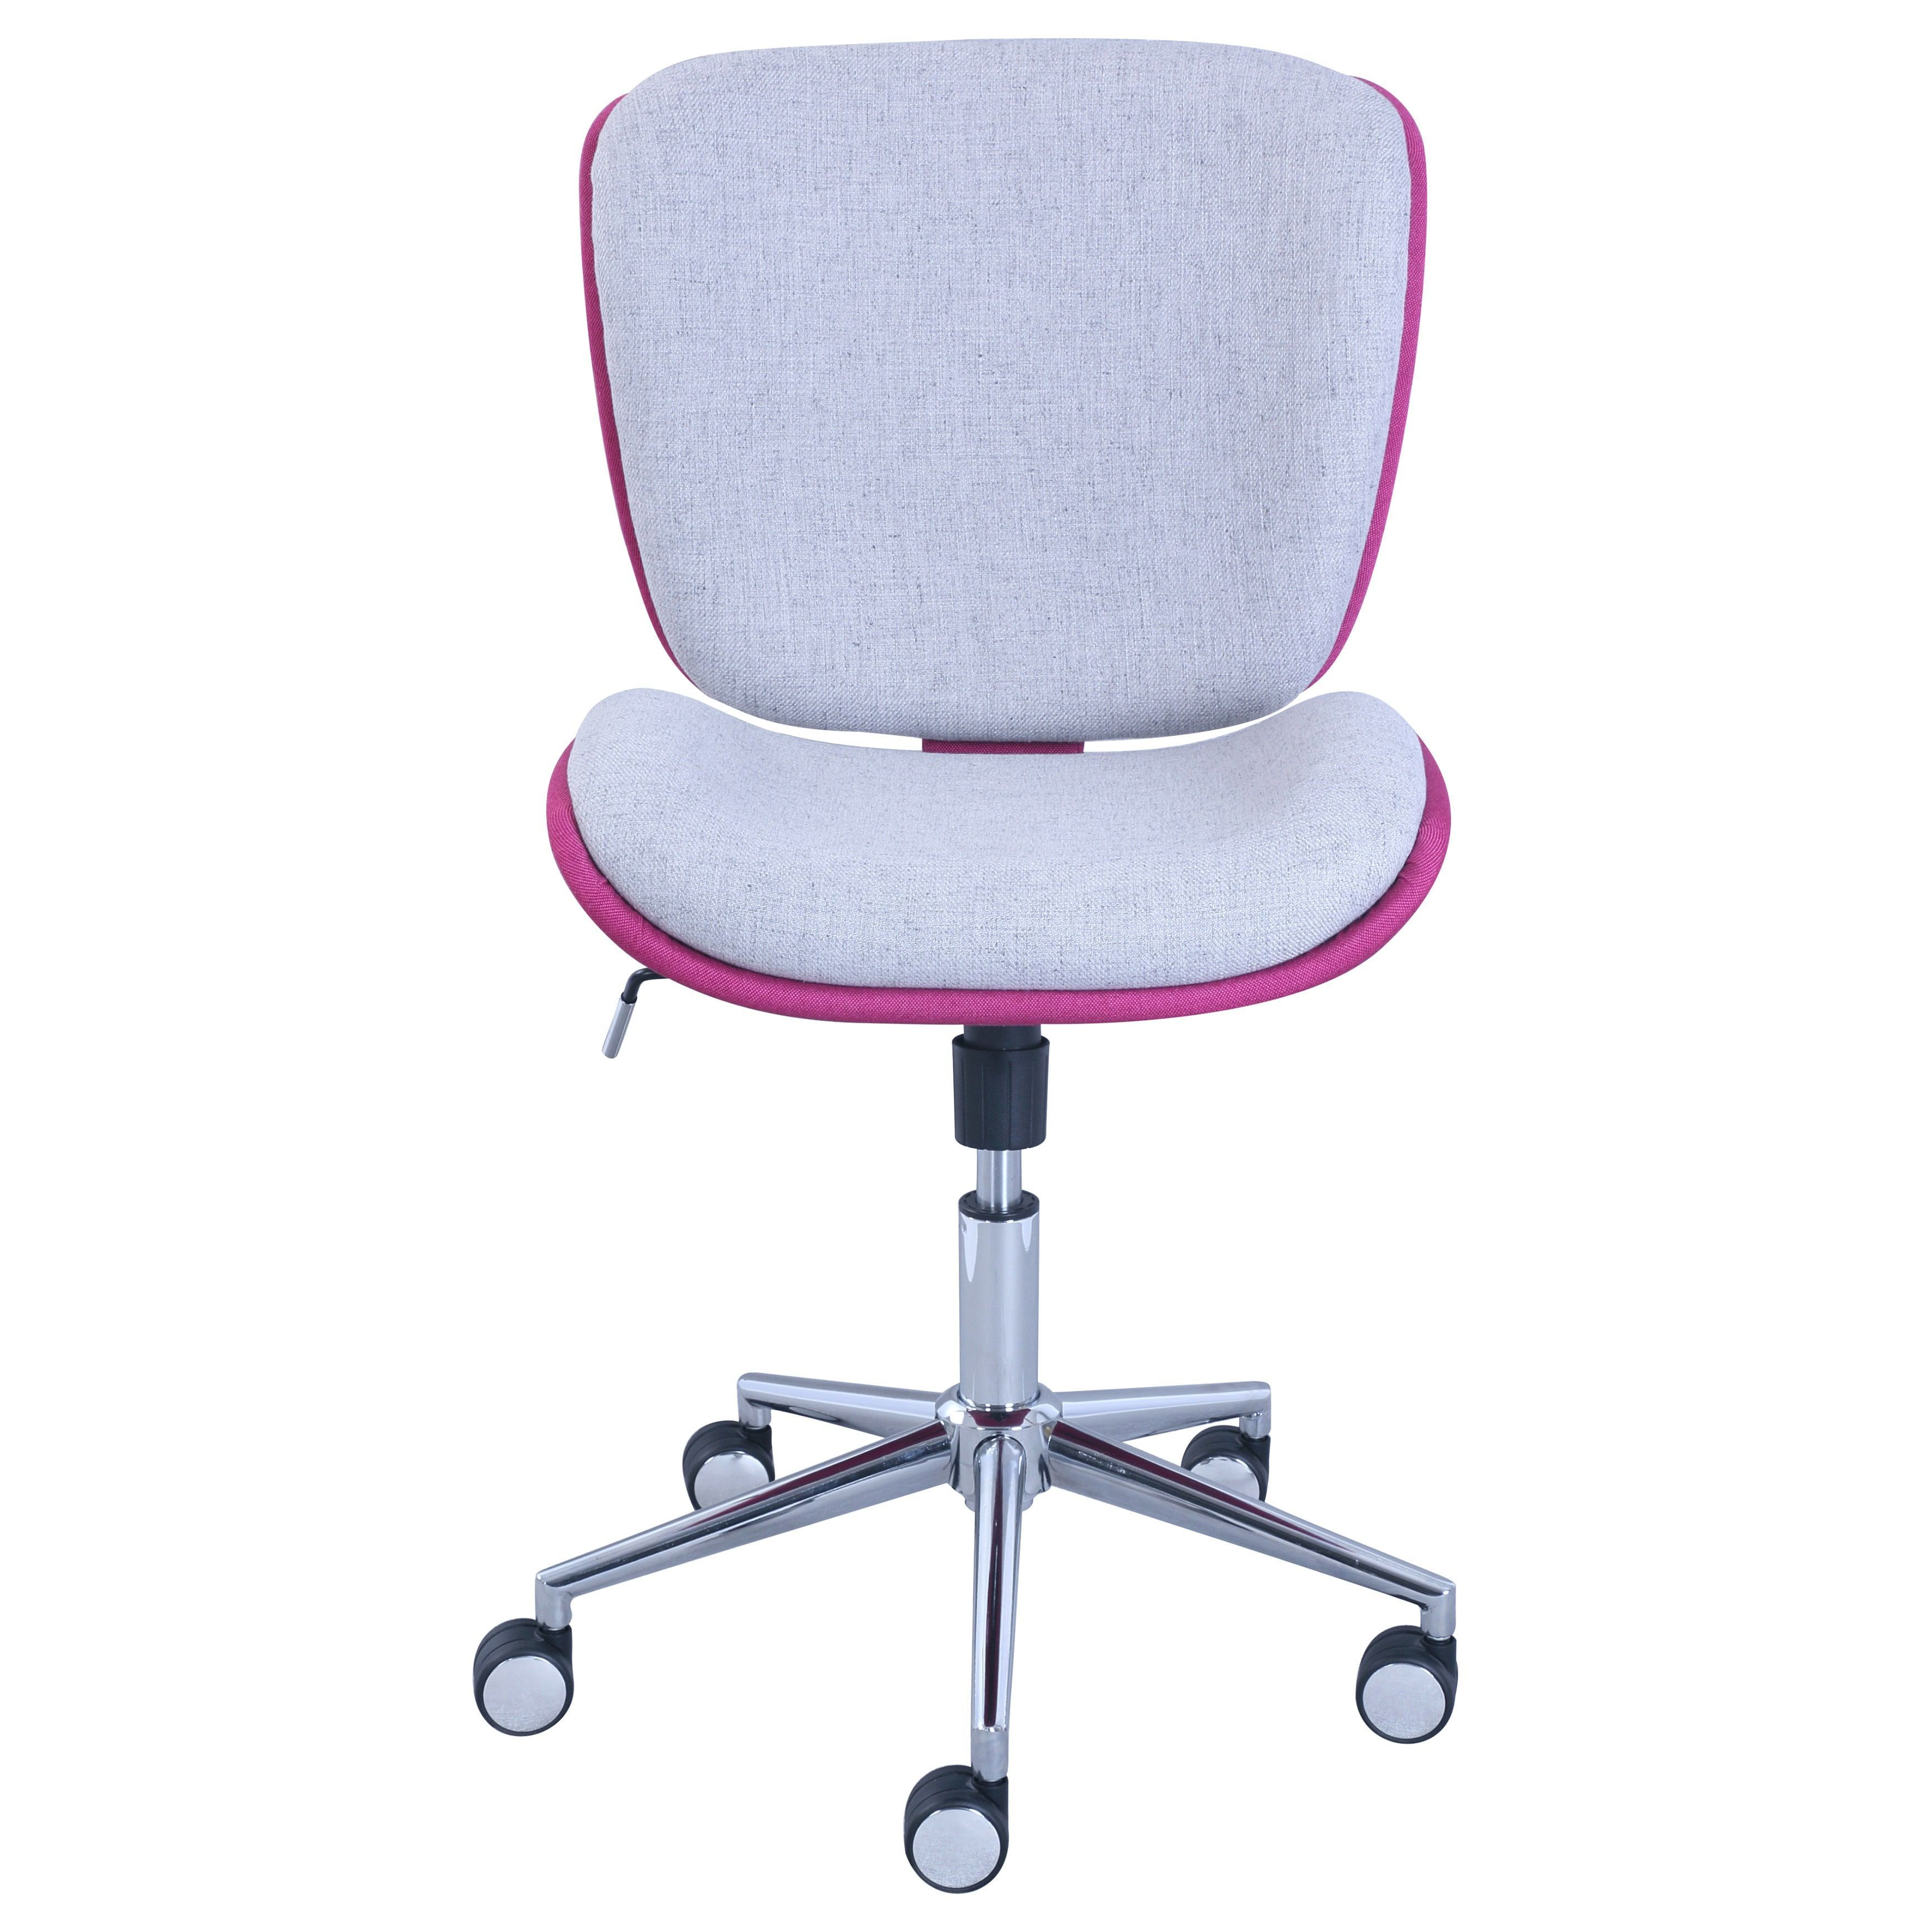 chair fcm office grey wiktionary buerostuhl wiki